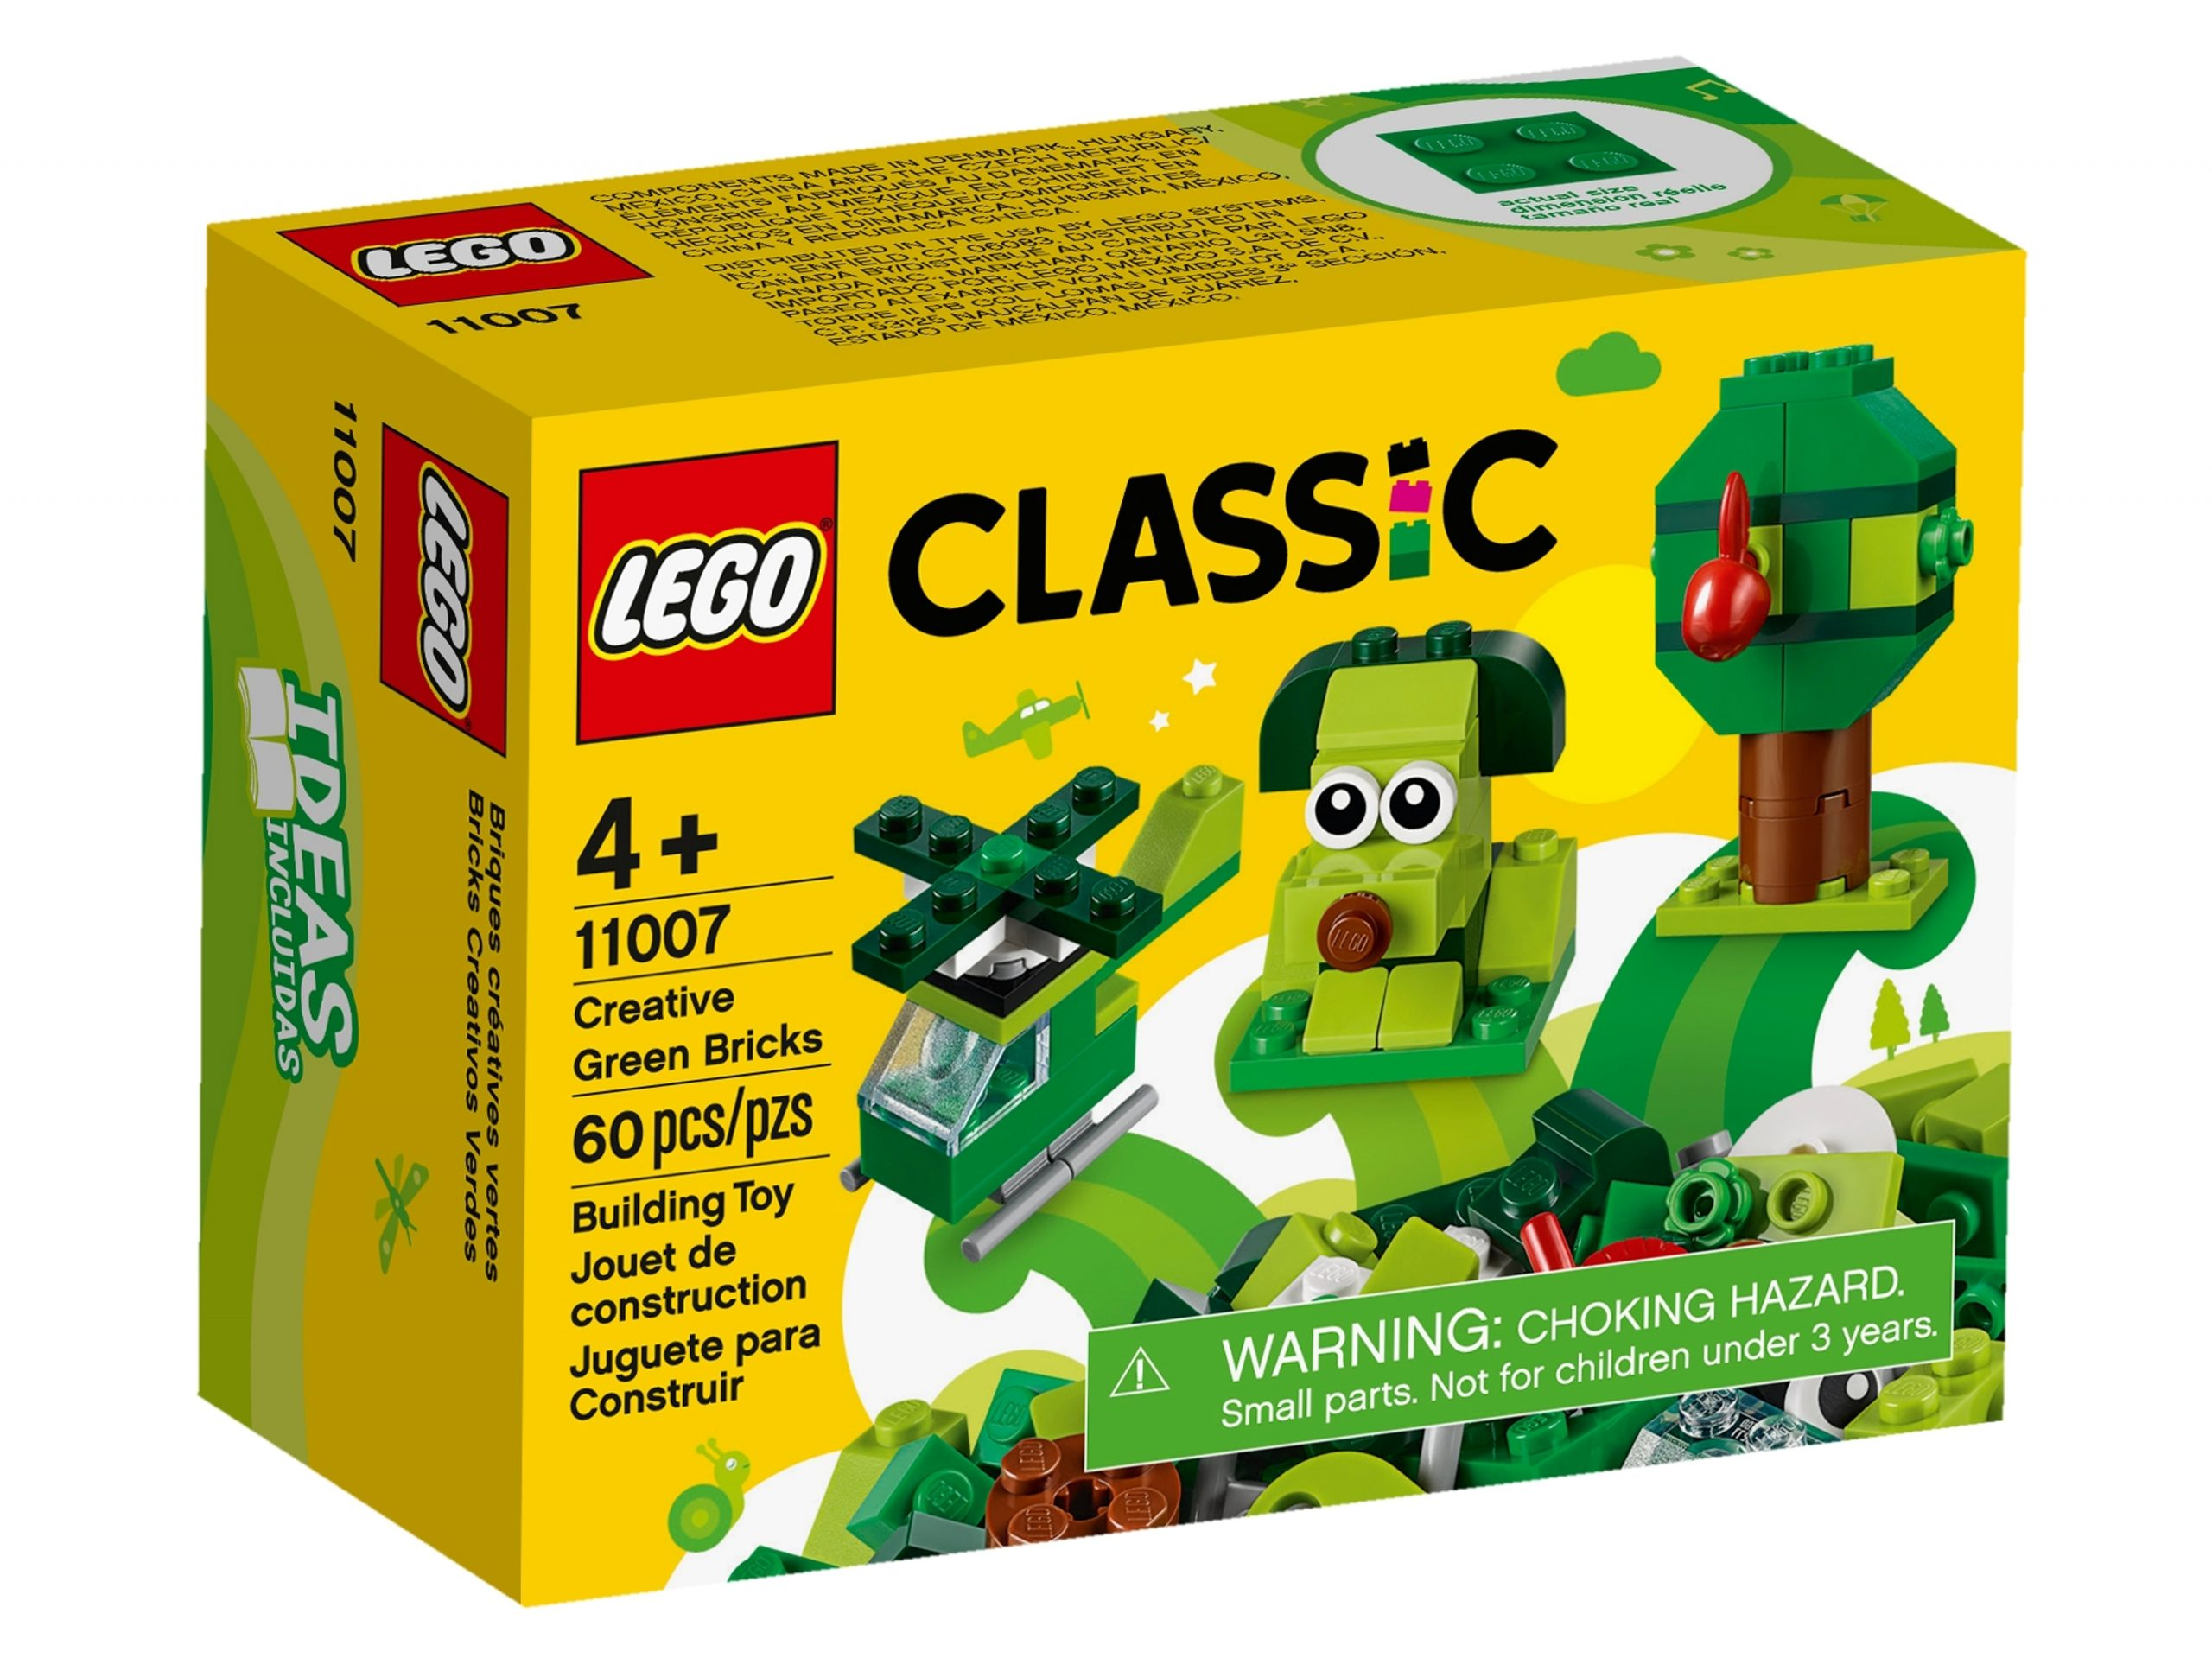 lego 11007 kreative gronne klodser scaled